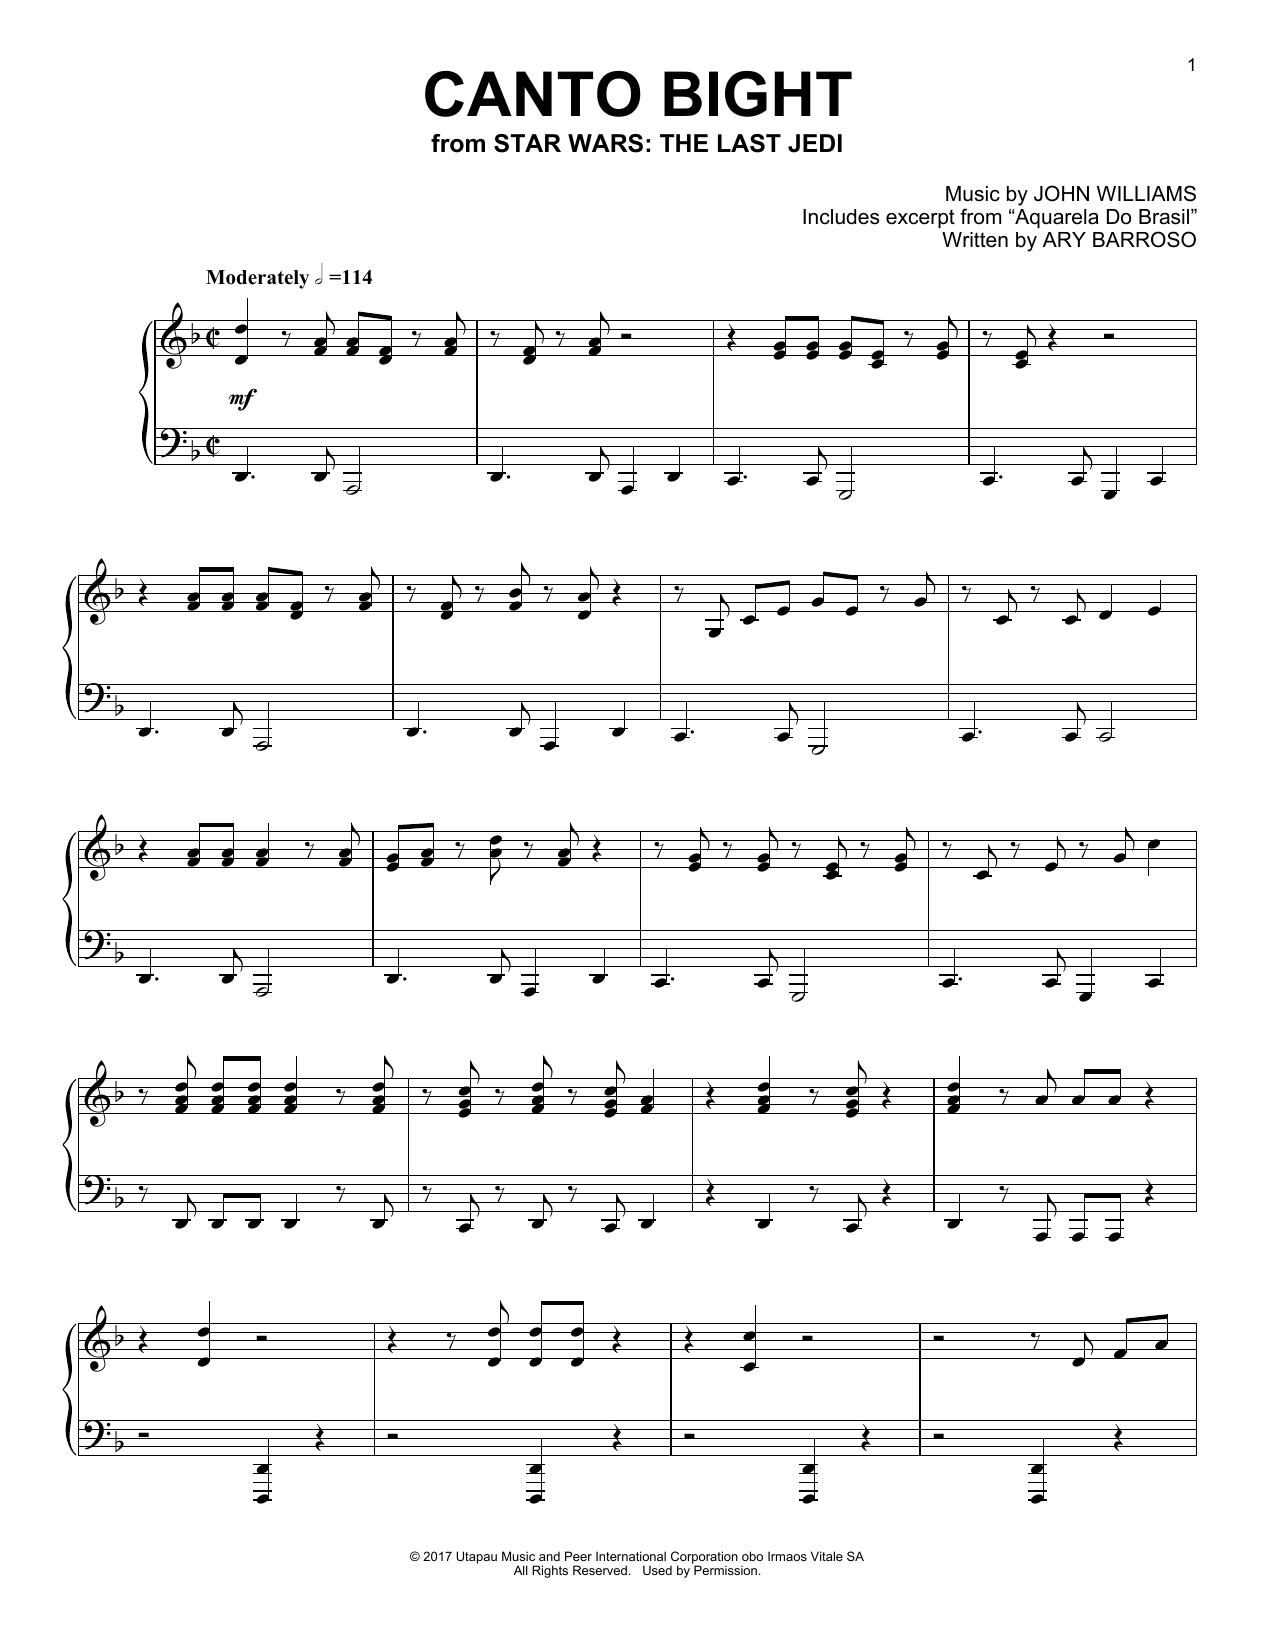 Canto Bight By John Williams Digital Sheet Music Sheet Music